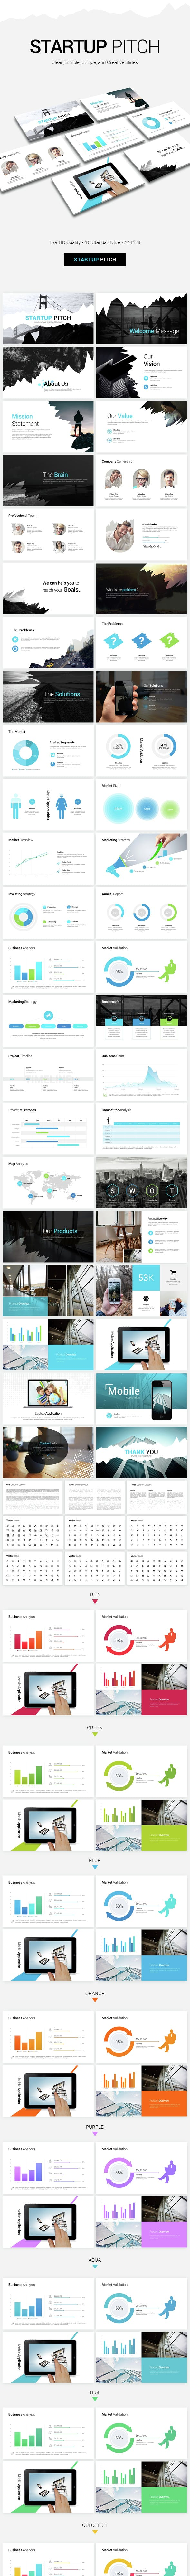 startup pitch presentation by pptx graphicriver